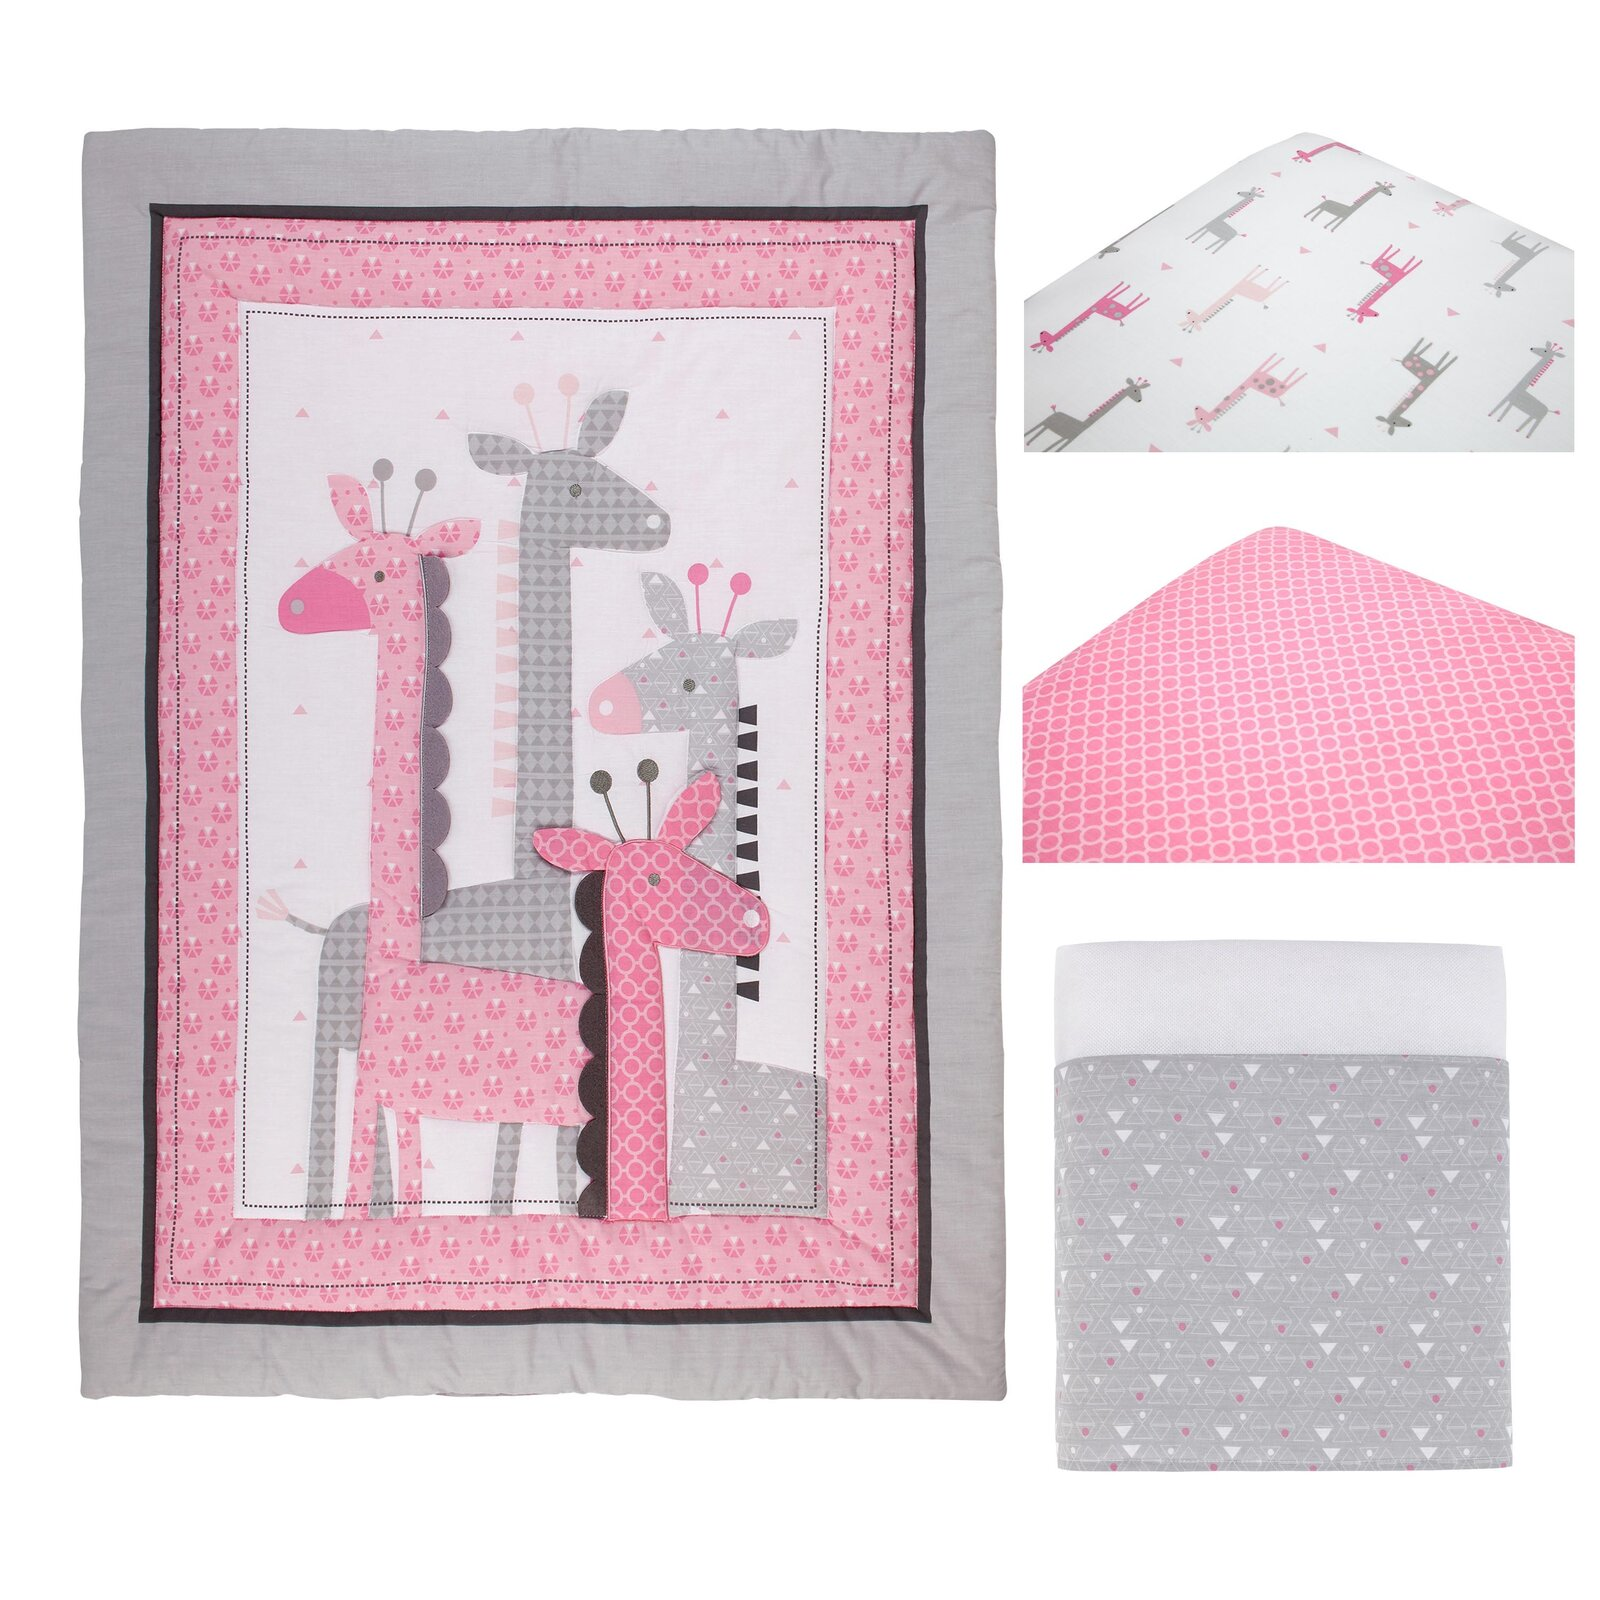 Stepan Giraffe Infant 4 Piece Crib Bedding Set